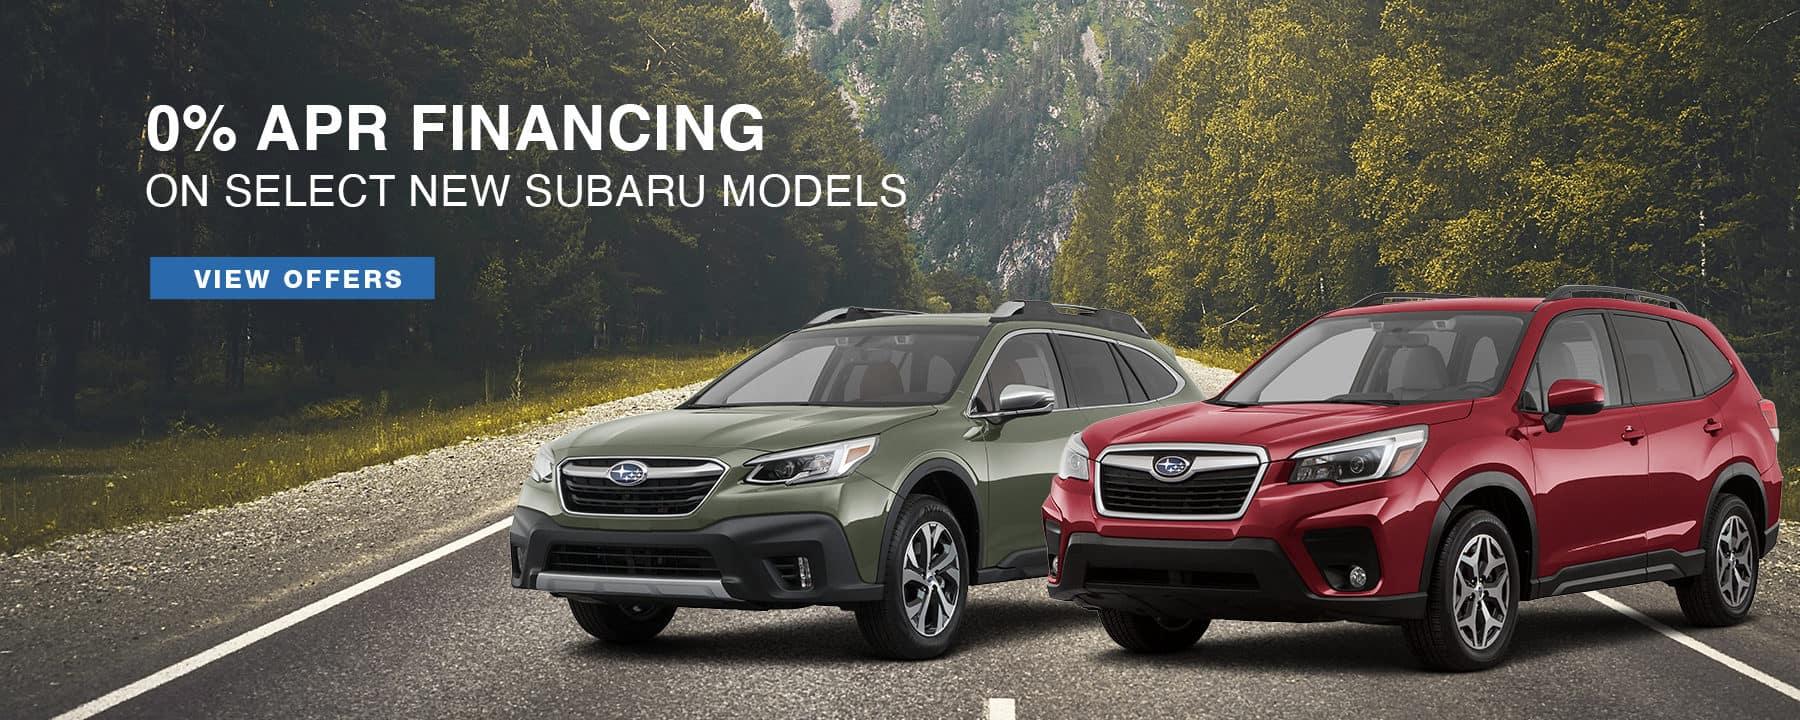 Homepage-Banner-Subaru-m7-0apr